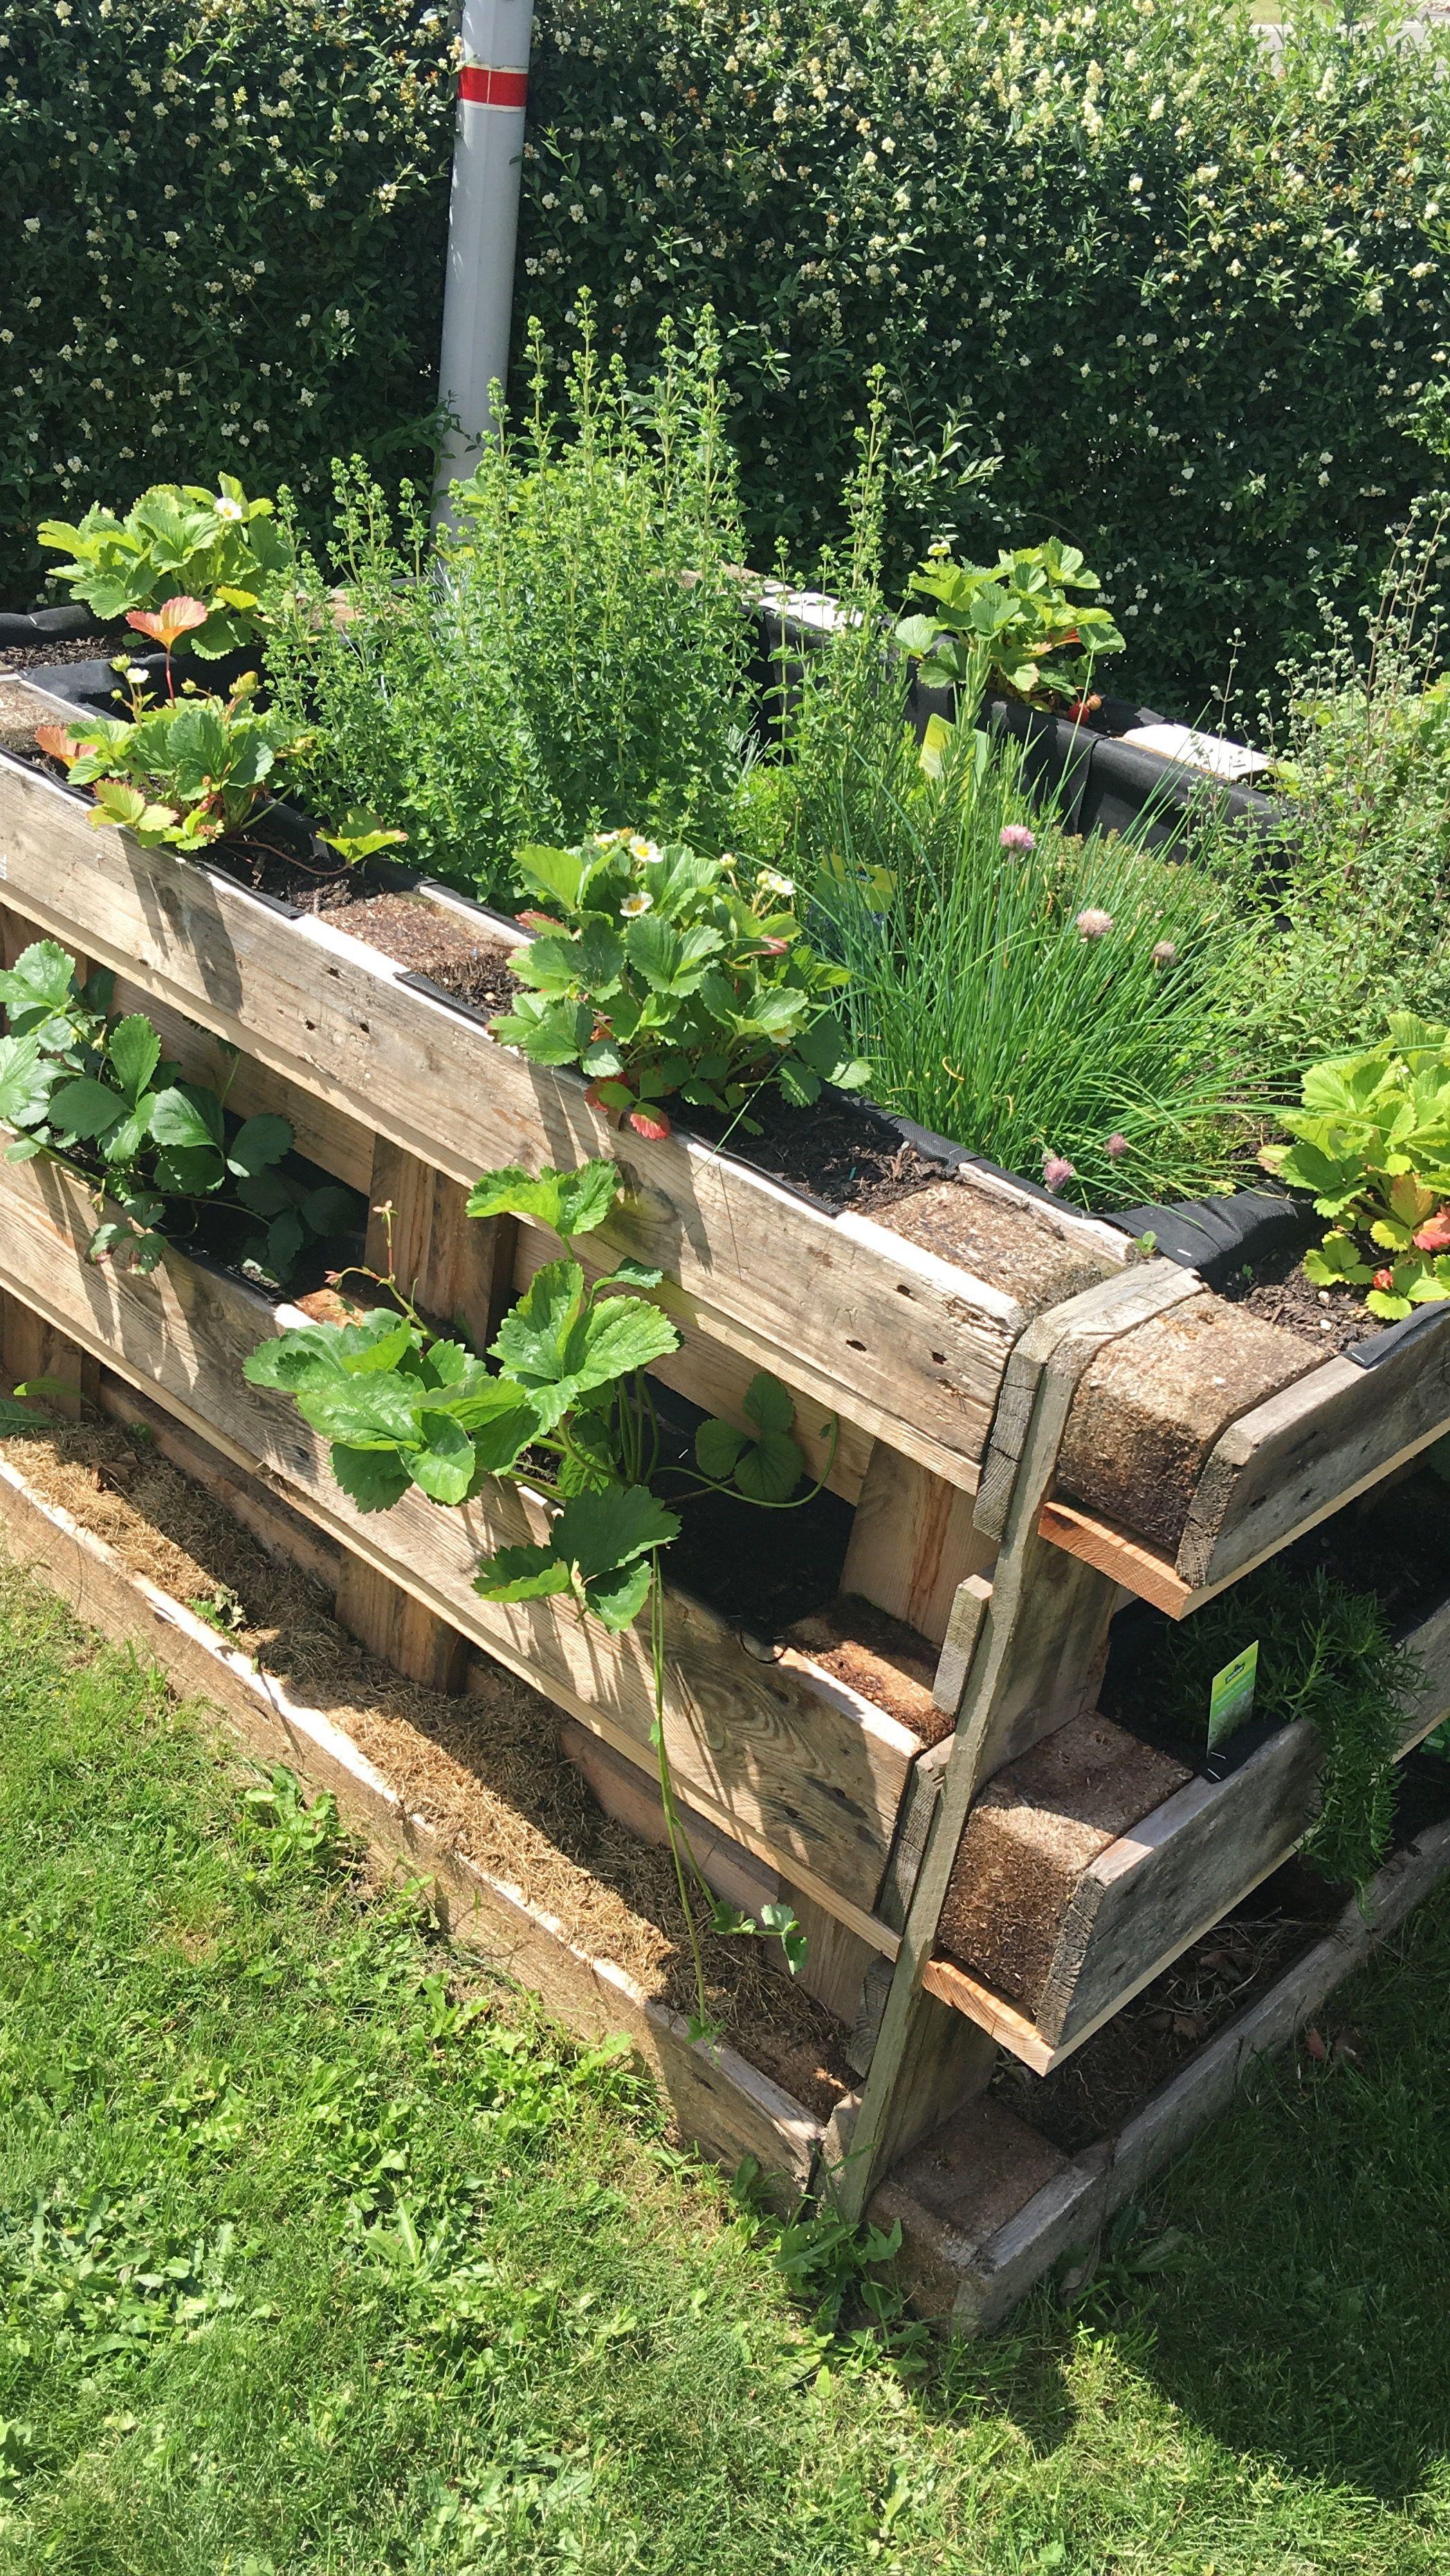 Erdbeeren Gartengestaltung Hochbeet Gartengestaltung Hochbeet